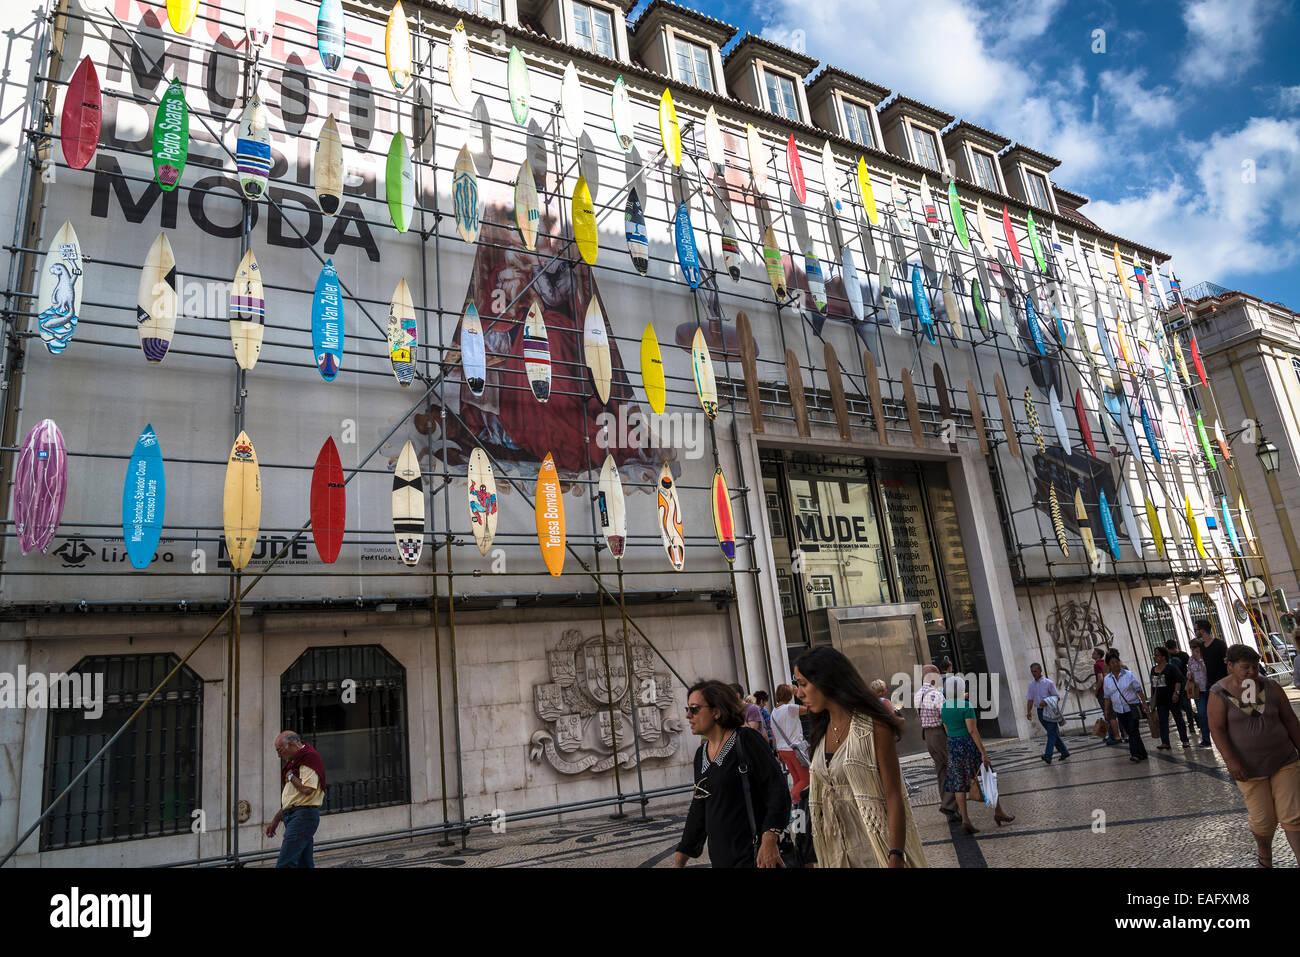 Design And Fashion Museum Mude Lisbon Portugal Stock Photo Alamy